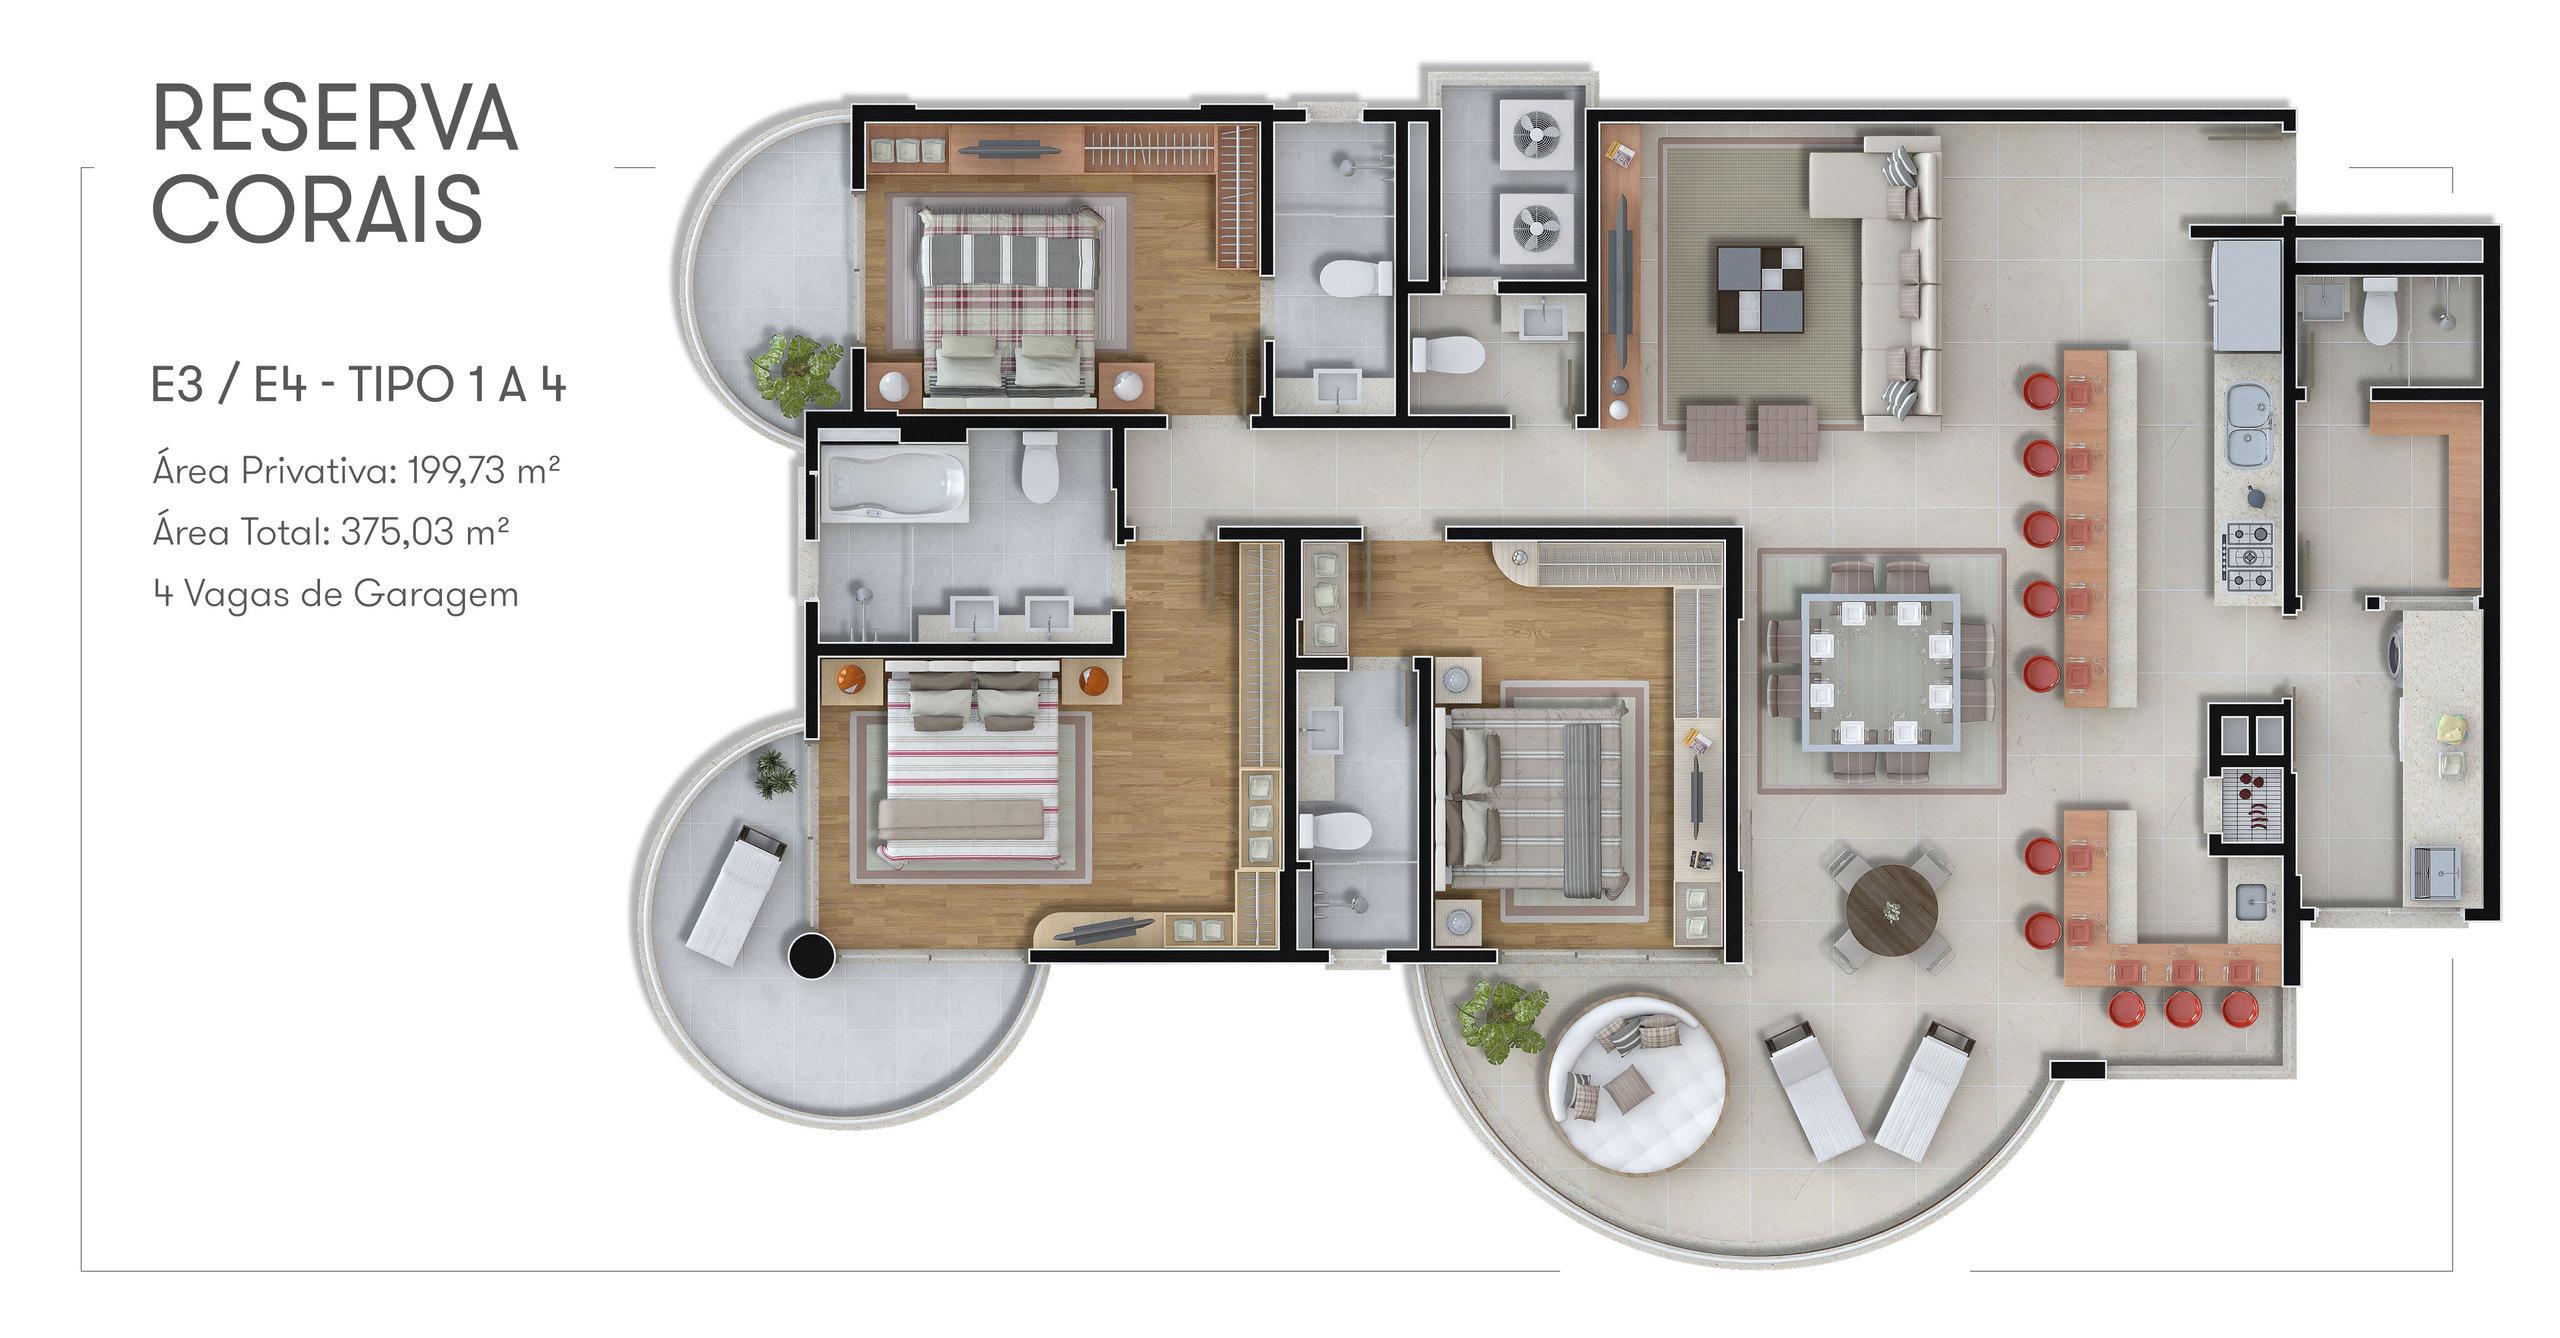 Reserva Corais - Apartamento Tipo